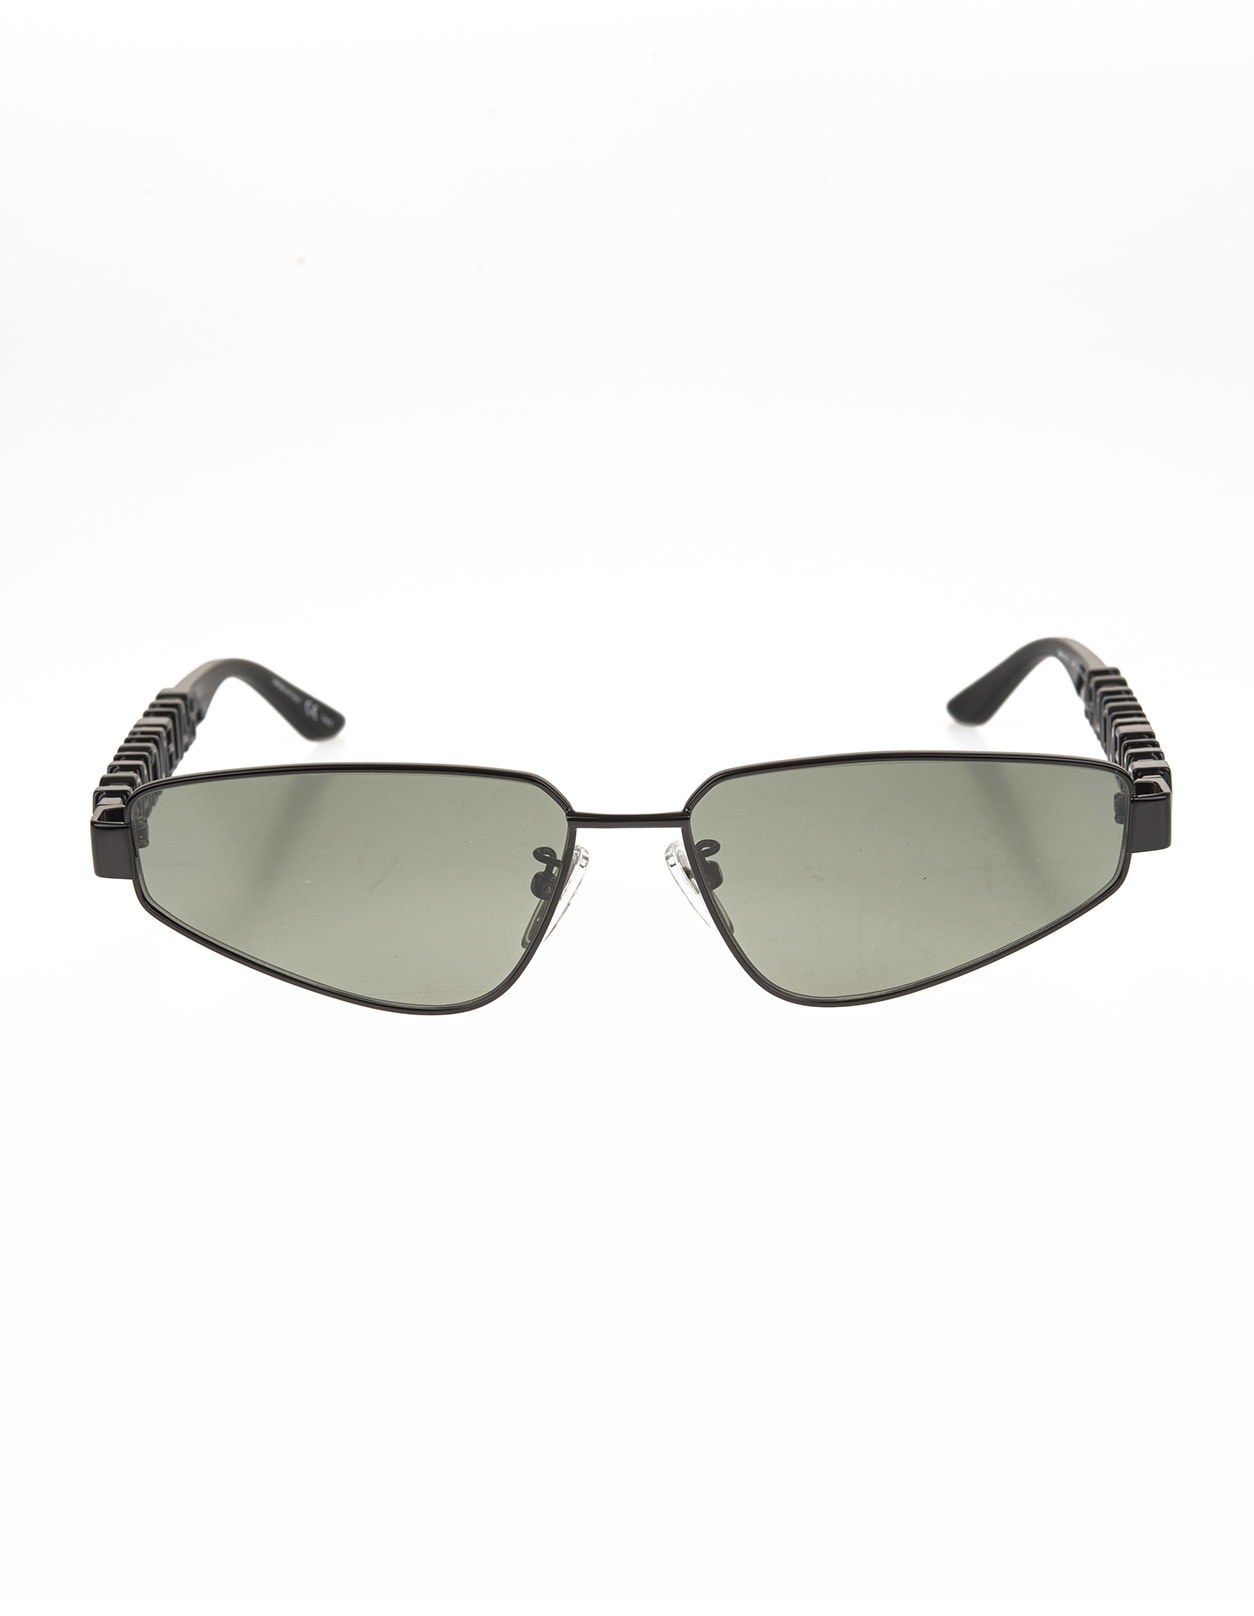 Black Typo Rectangle Sunglasses For Women